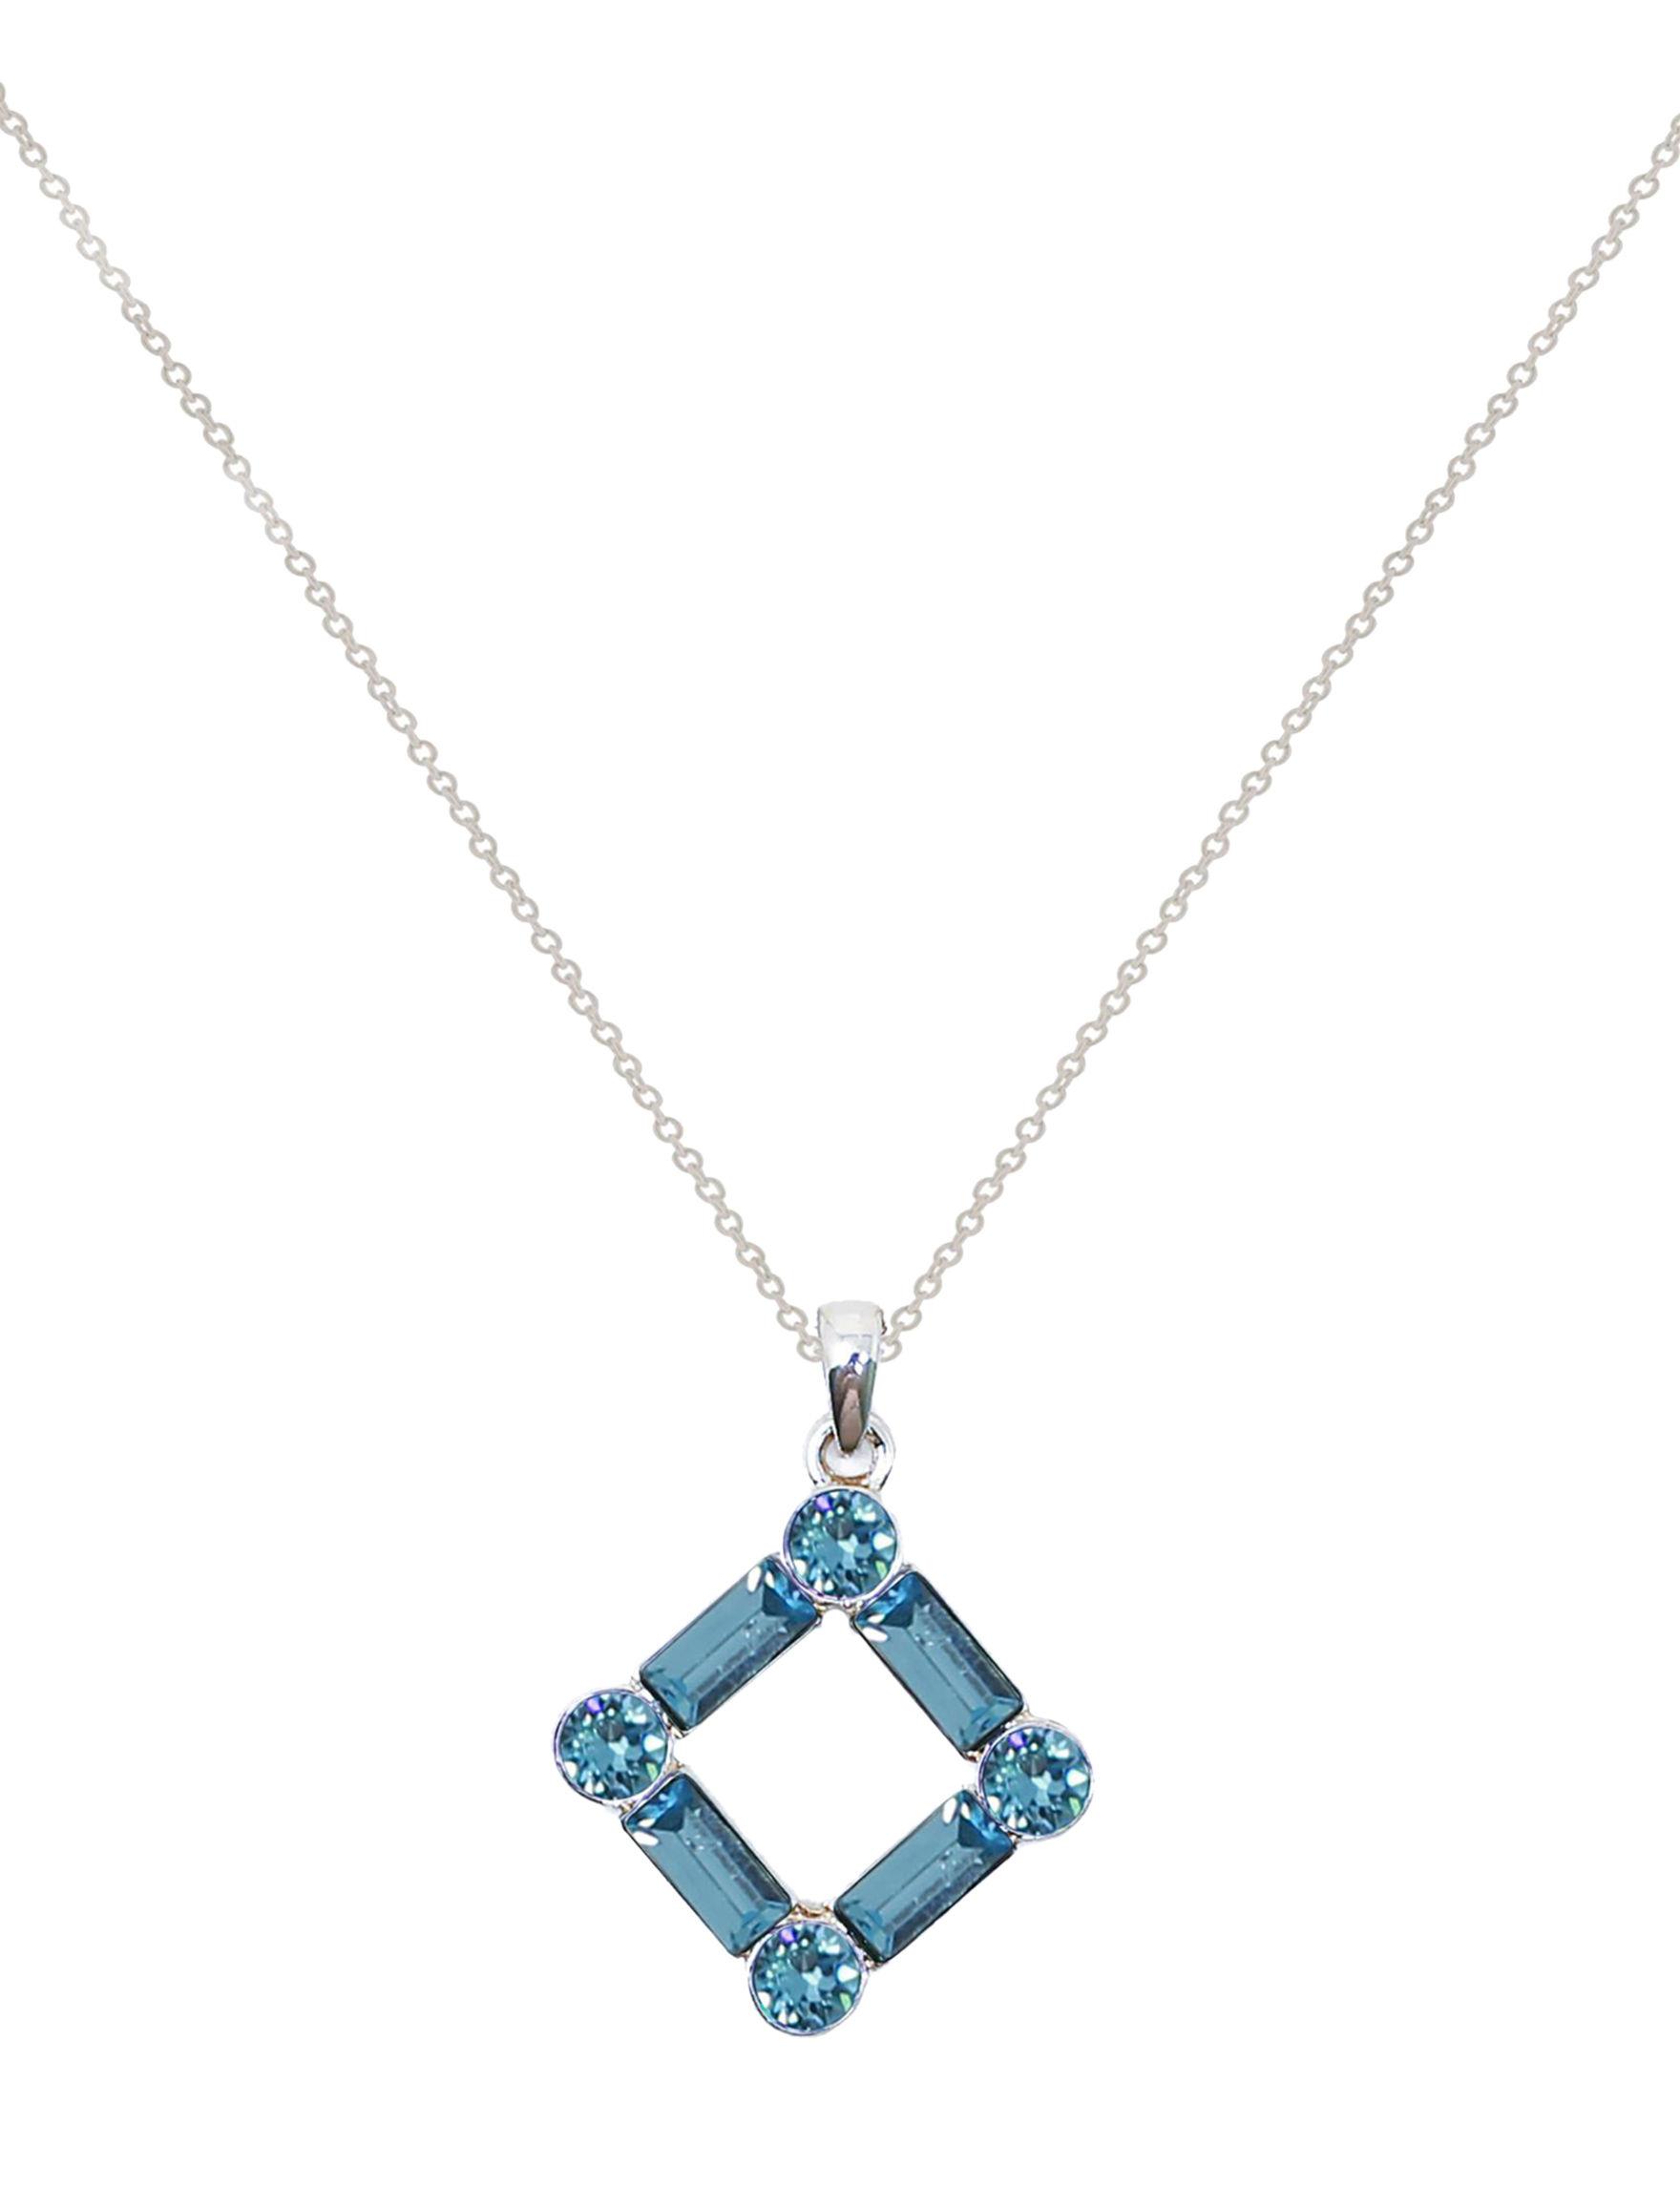 L & J Blue Crystal Necklaces & Pendants Fine Jewelry